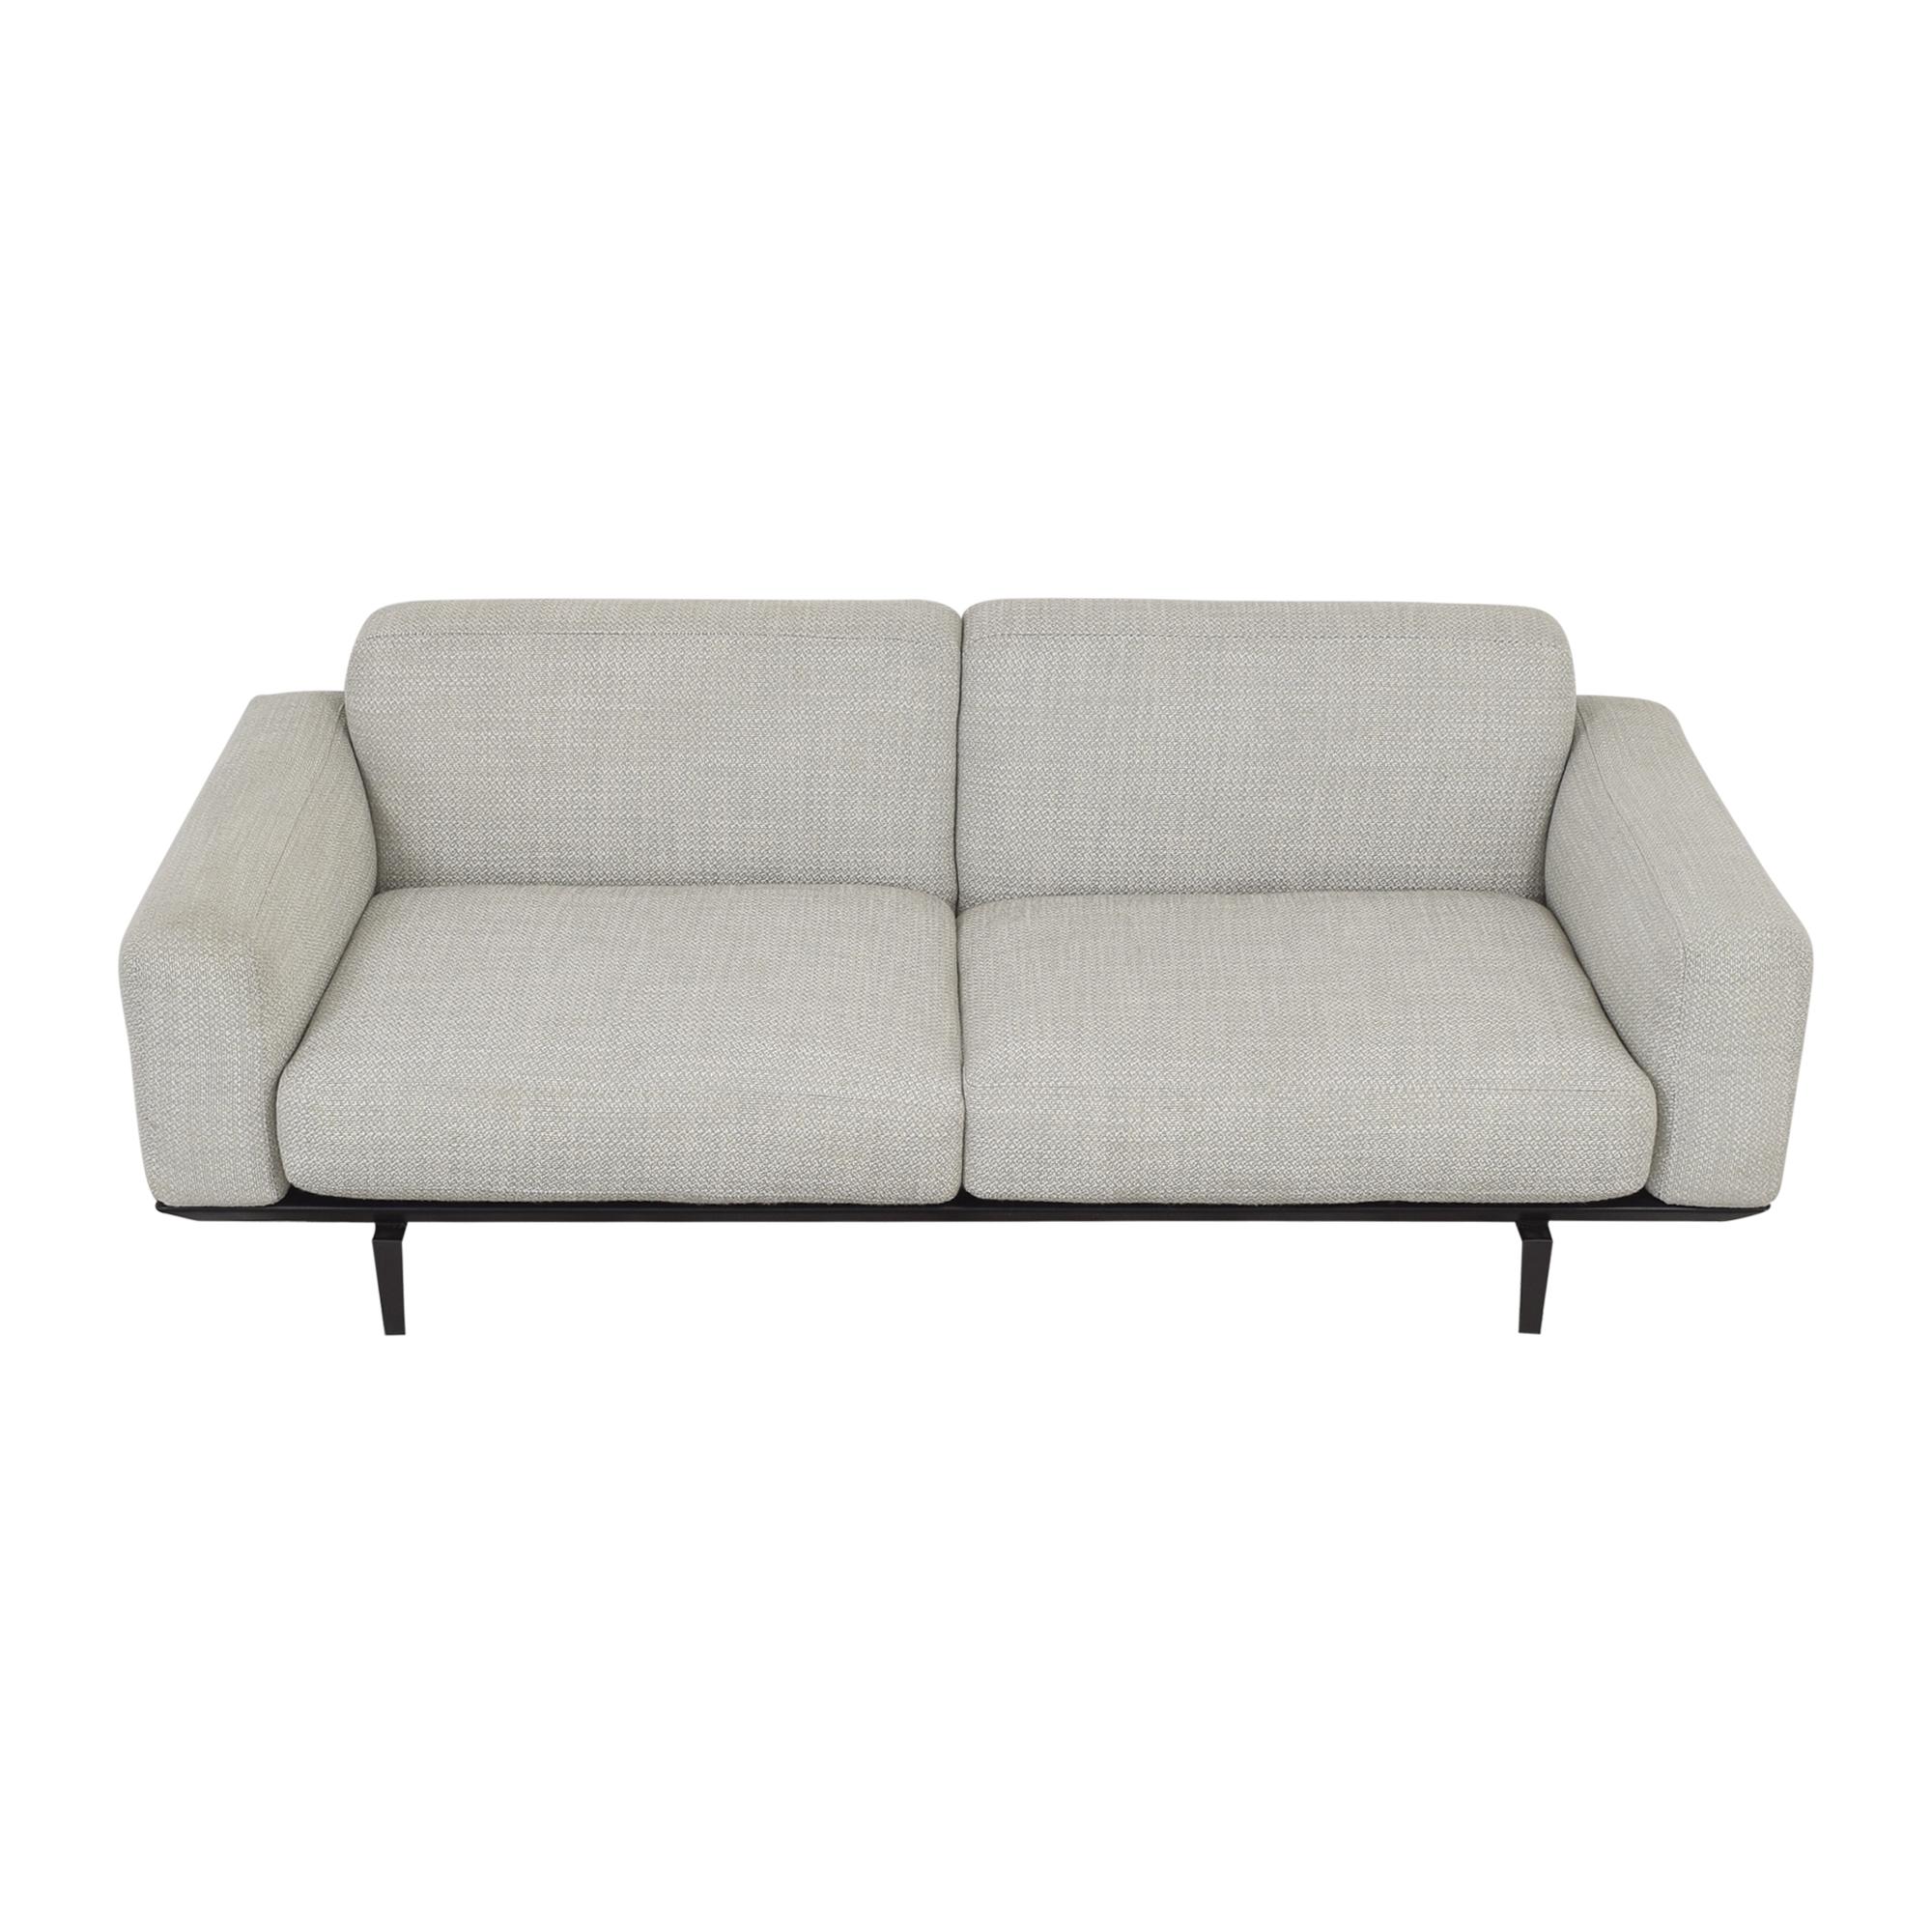 BoConcept BoConcept Two Cushion Sofa nj